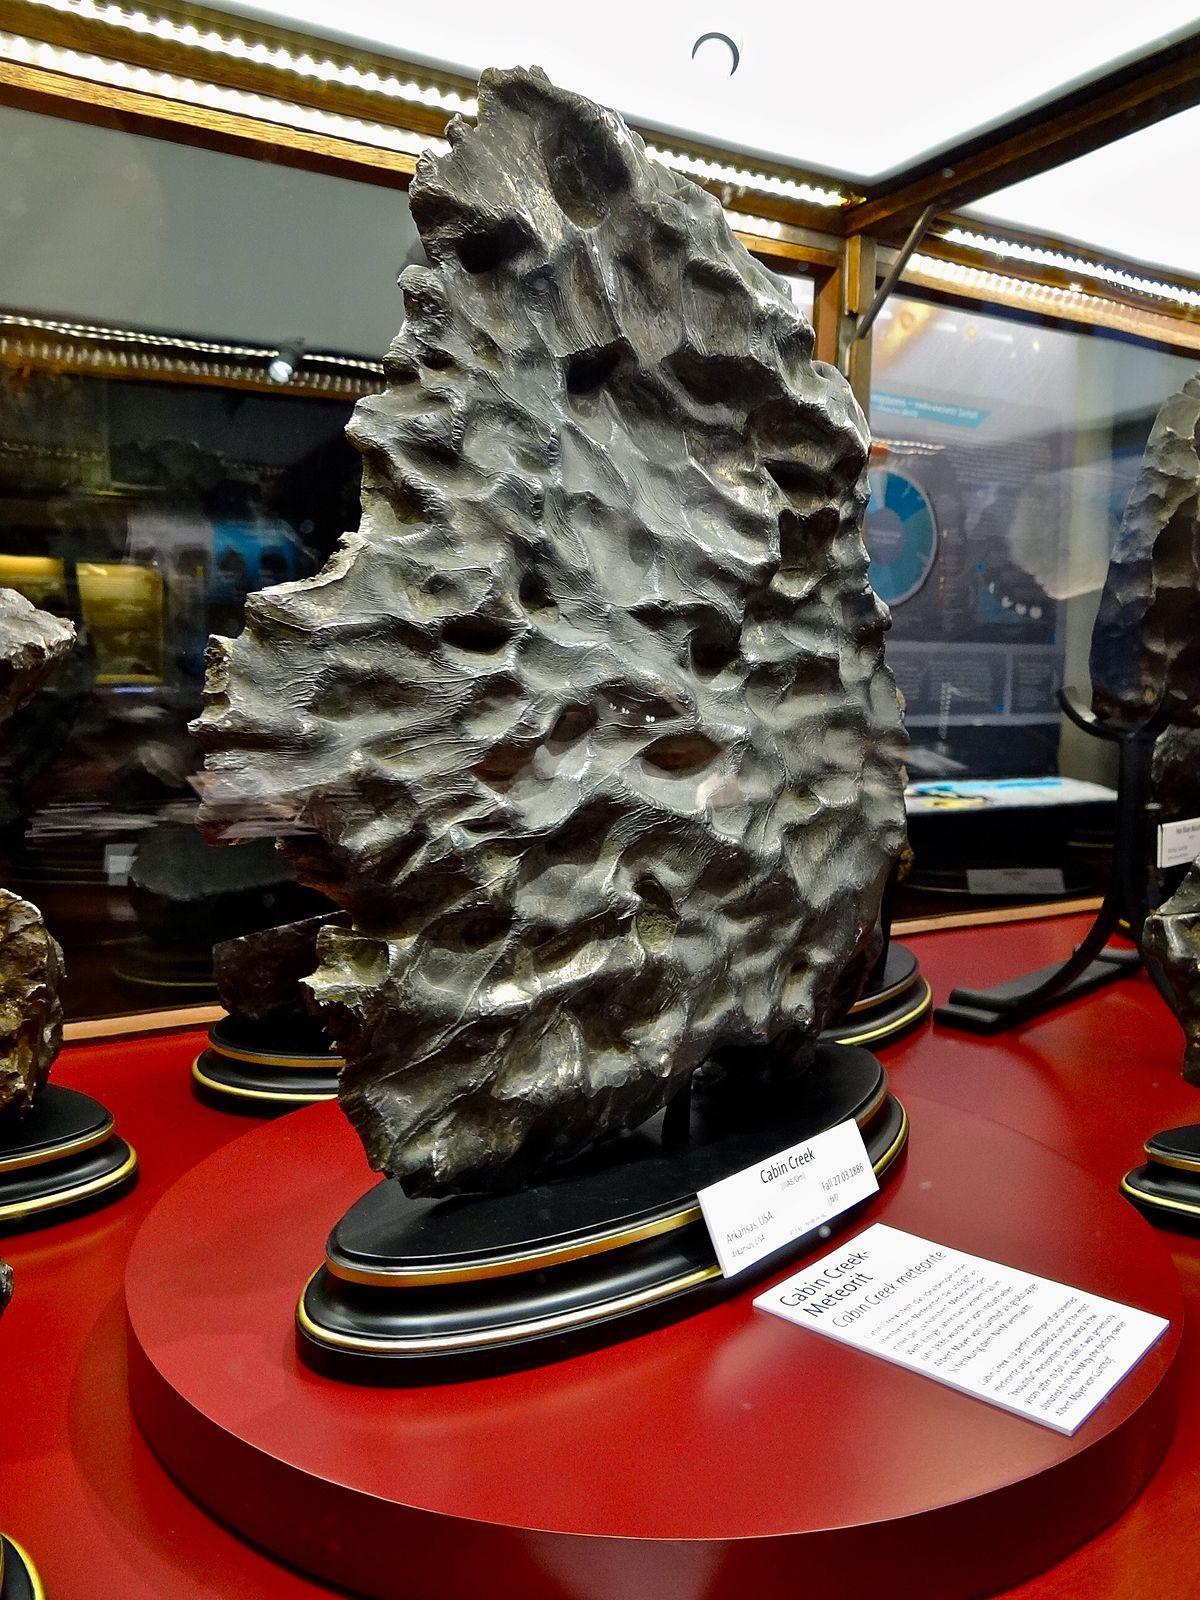 Meteorito - Wikipedia, la enciclopedia libre